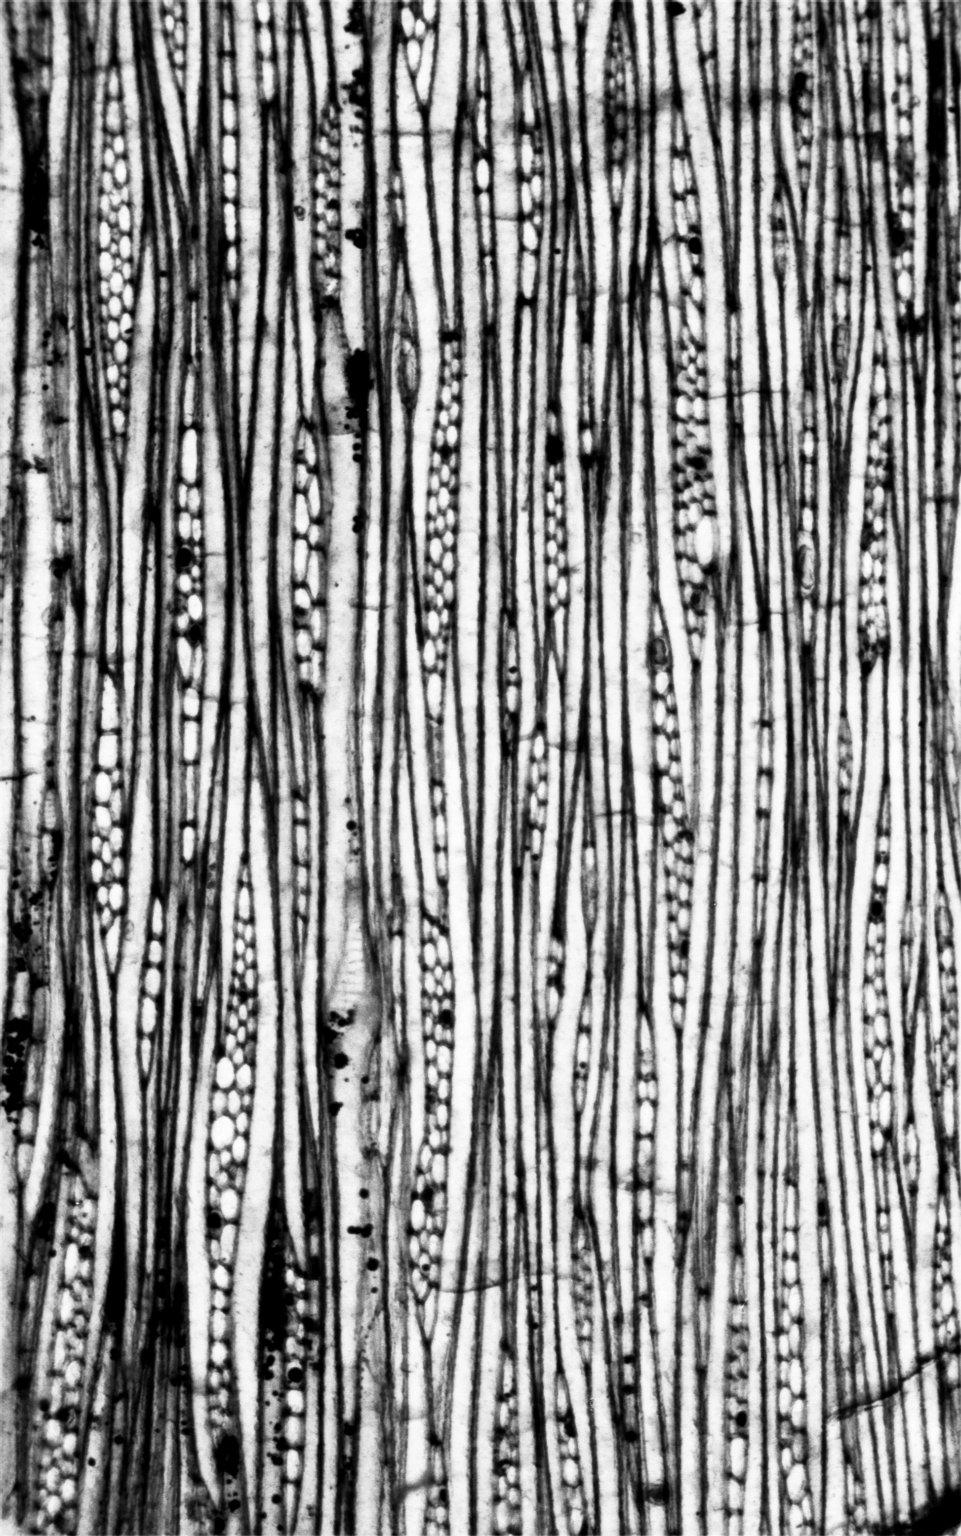 MAGNOLIACEAE Magnoliaceoxylon cutlerii